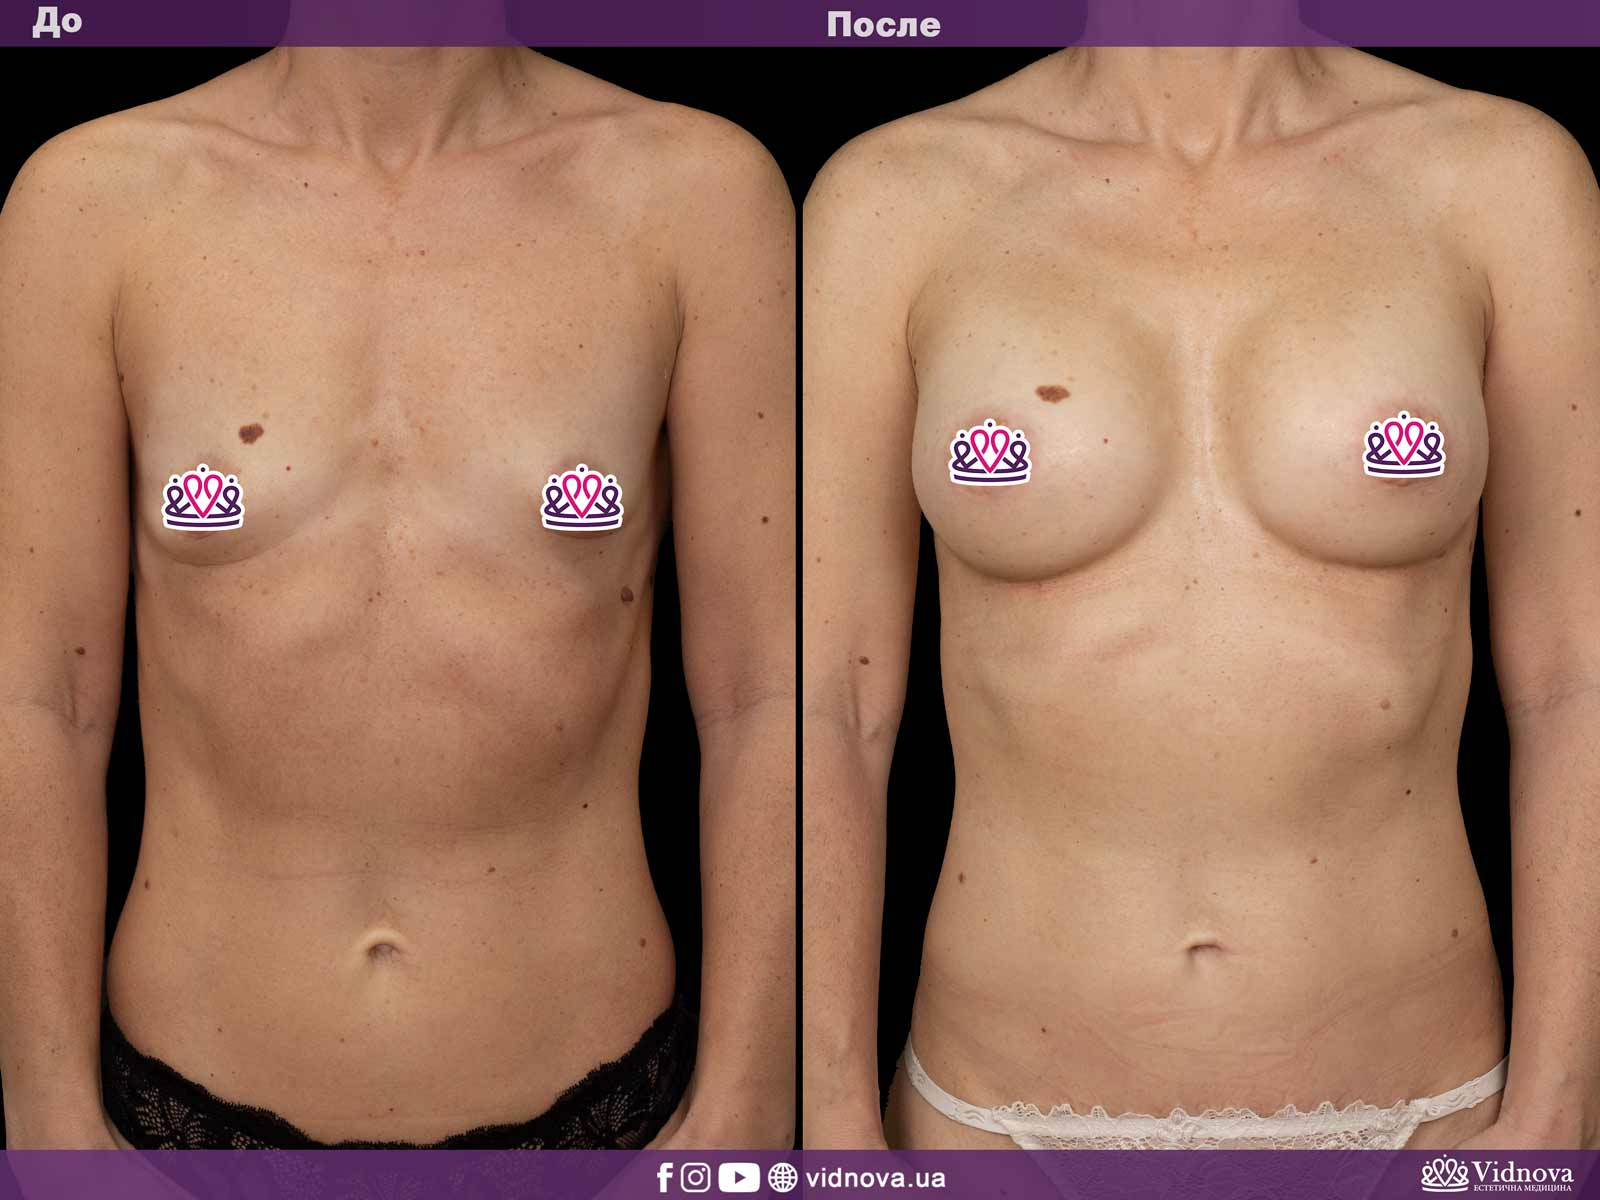 Увеличение груди: Фото ДО и ПОСЛЕ - Пример №26-1 - Клиника Vidnova